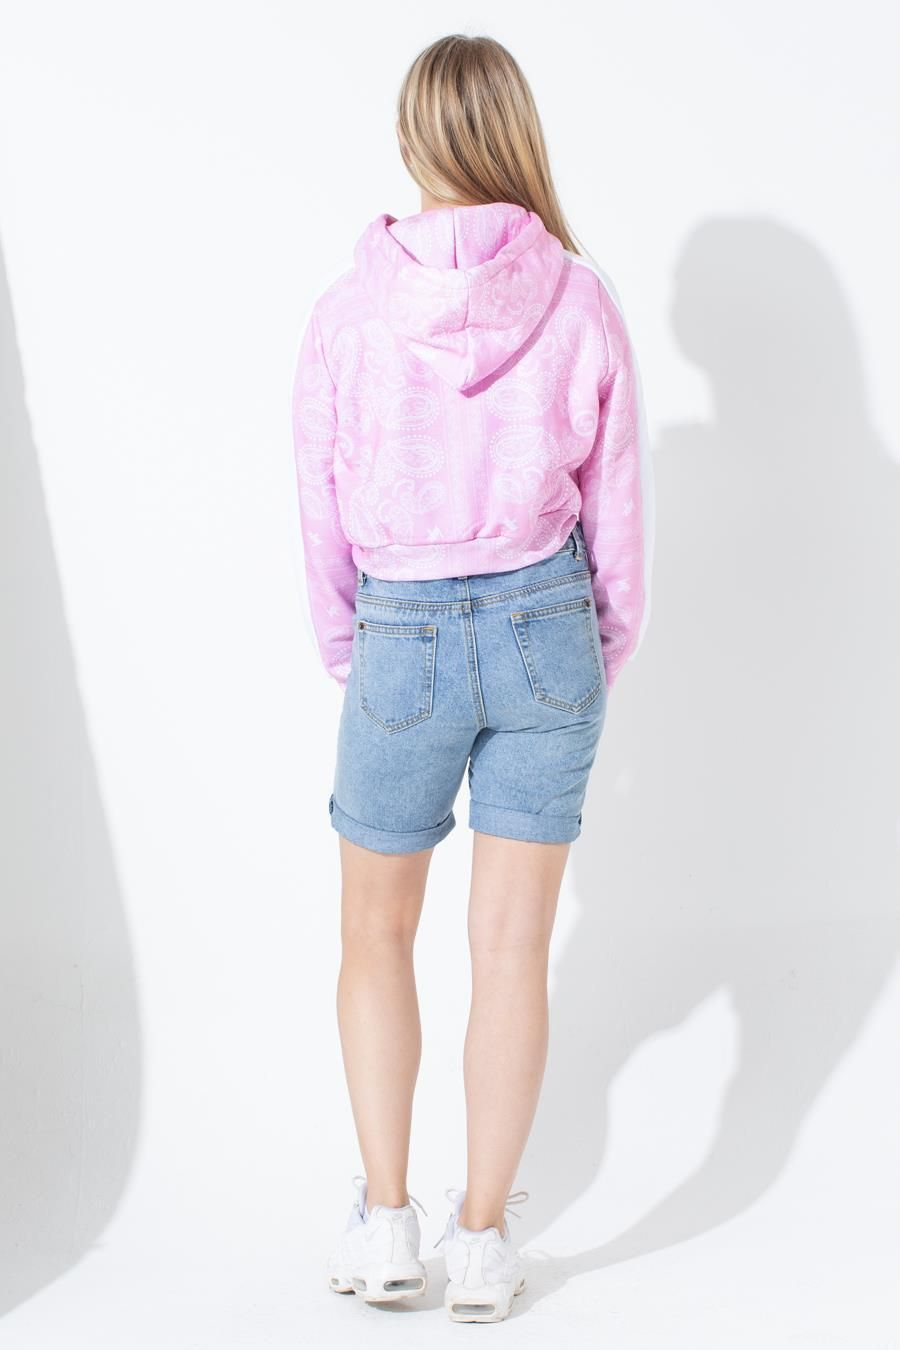 Hype Pink Bandana Kids Crop Hoodie